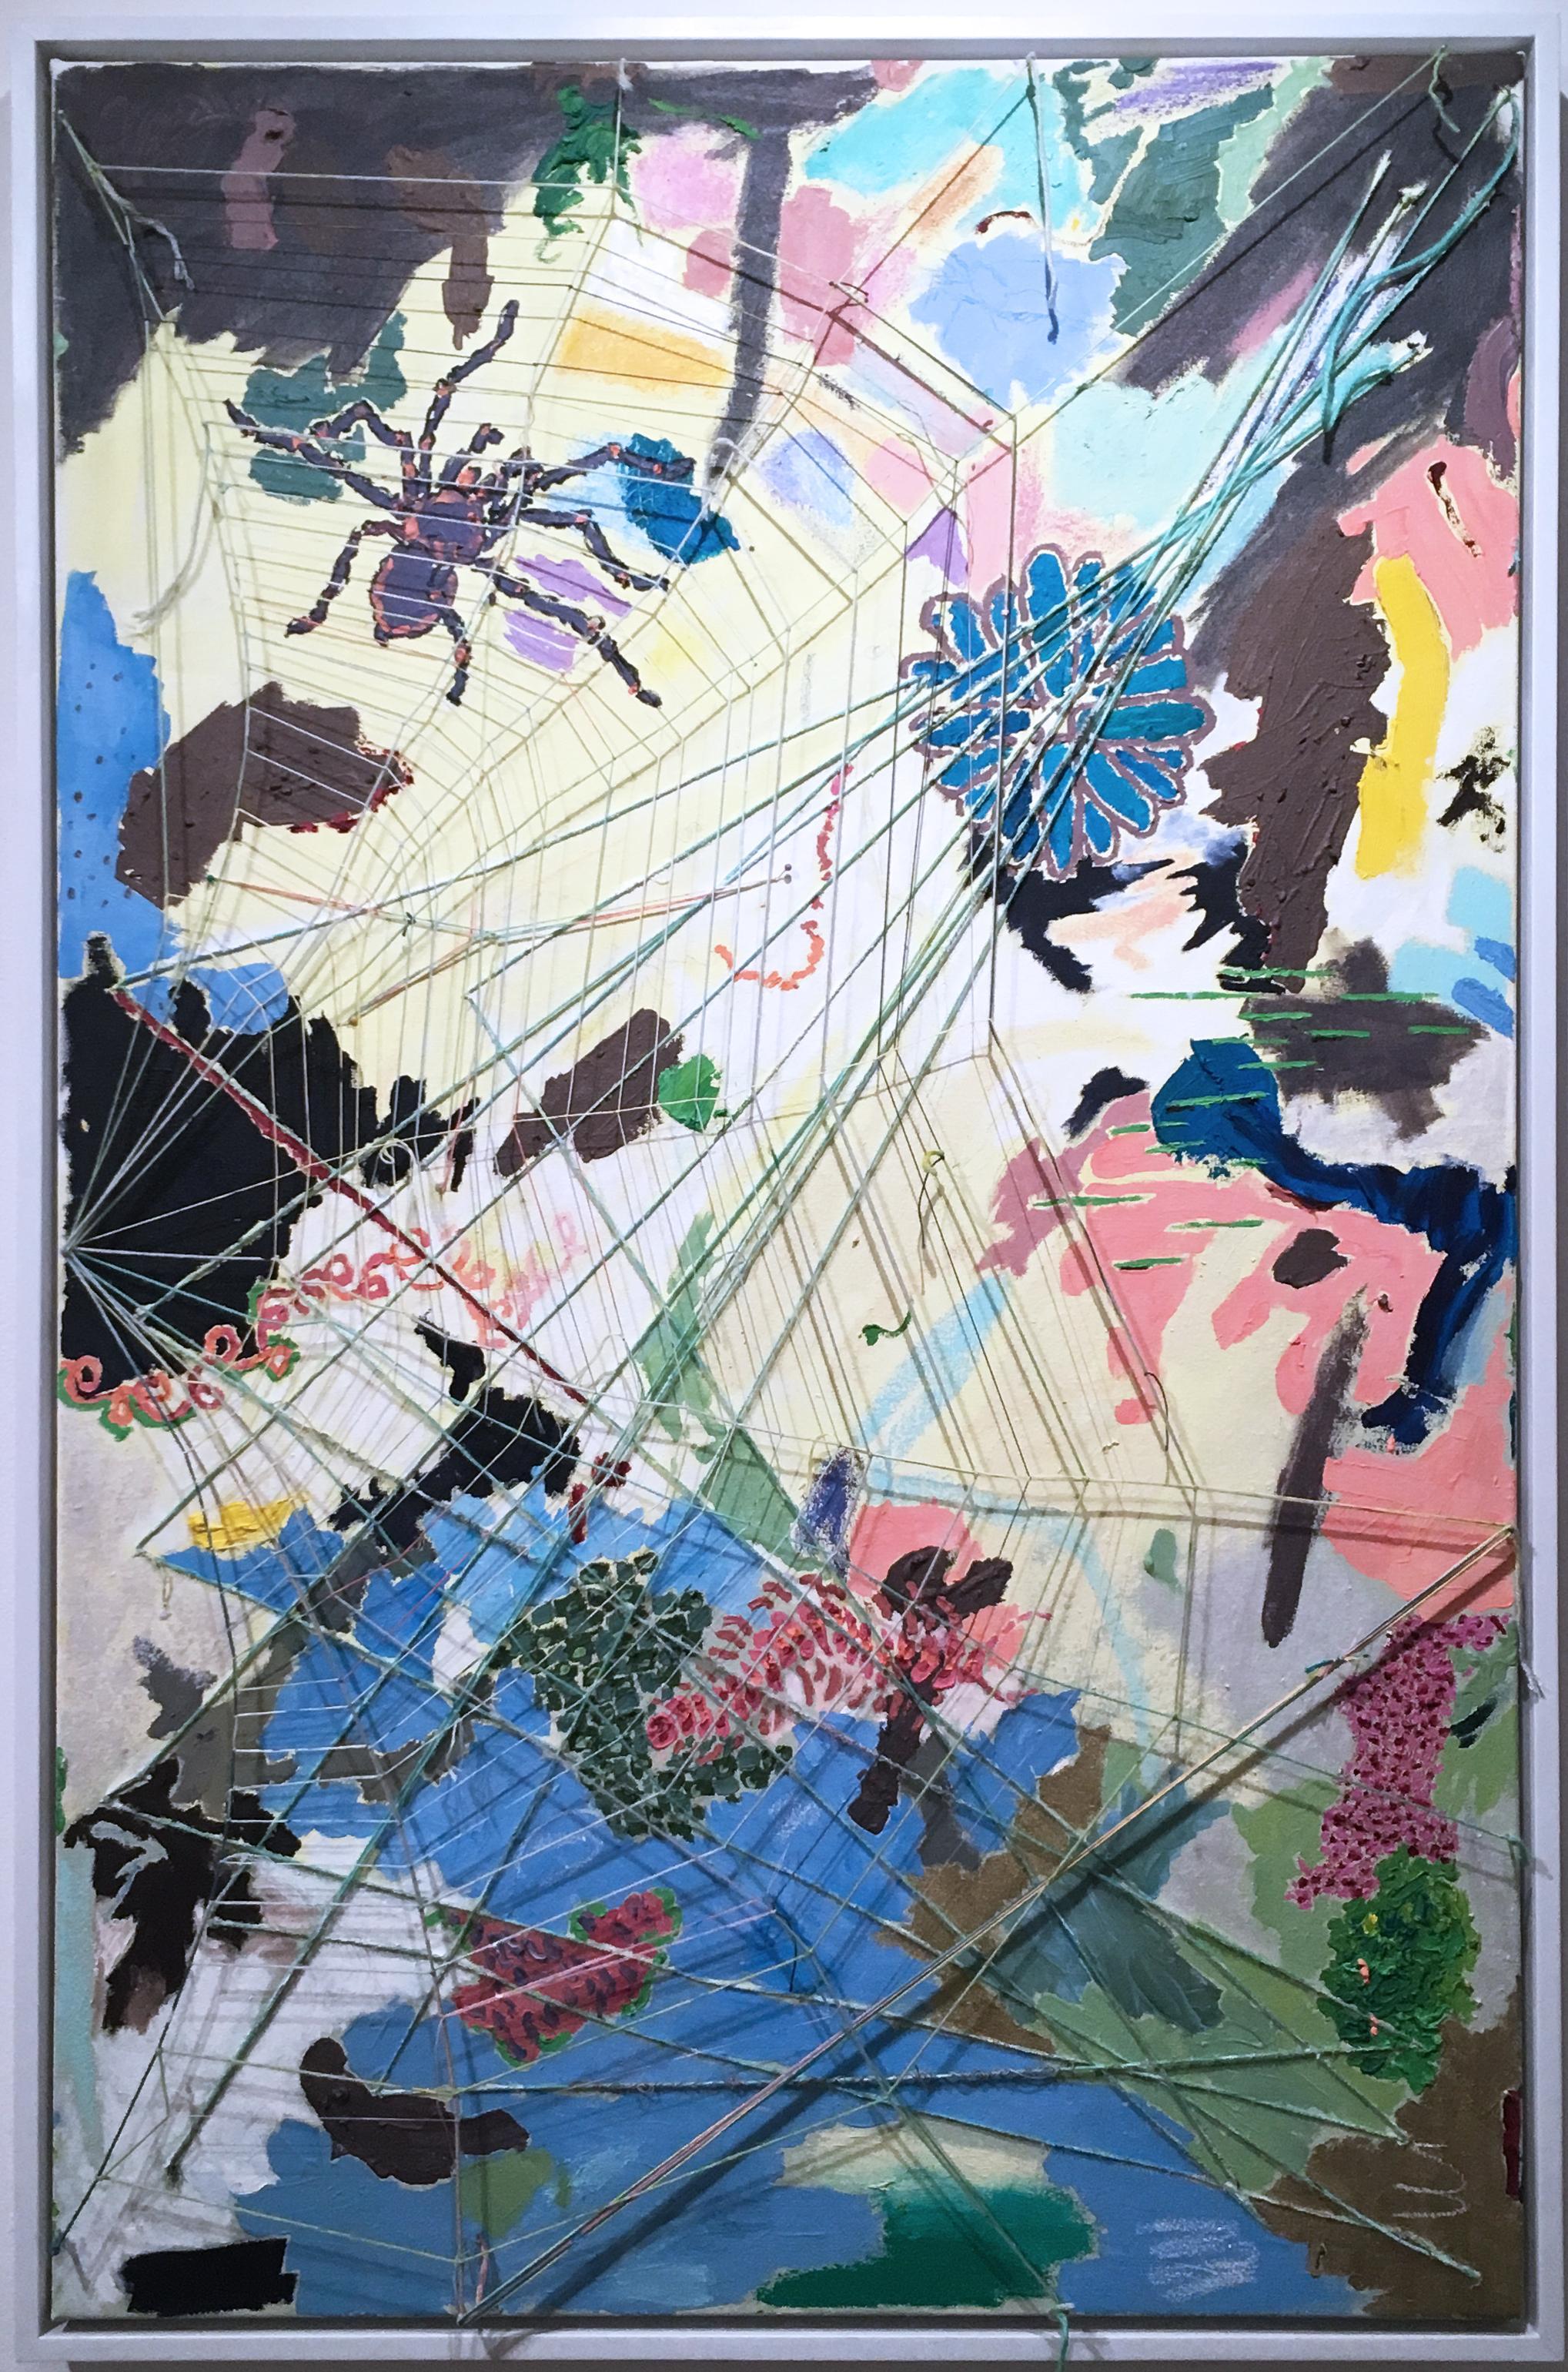 Half Web in Yellow, 2020, acrylic, oil, canvas, yarn, thread, blue, abstract